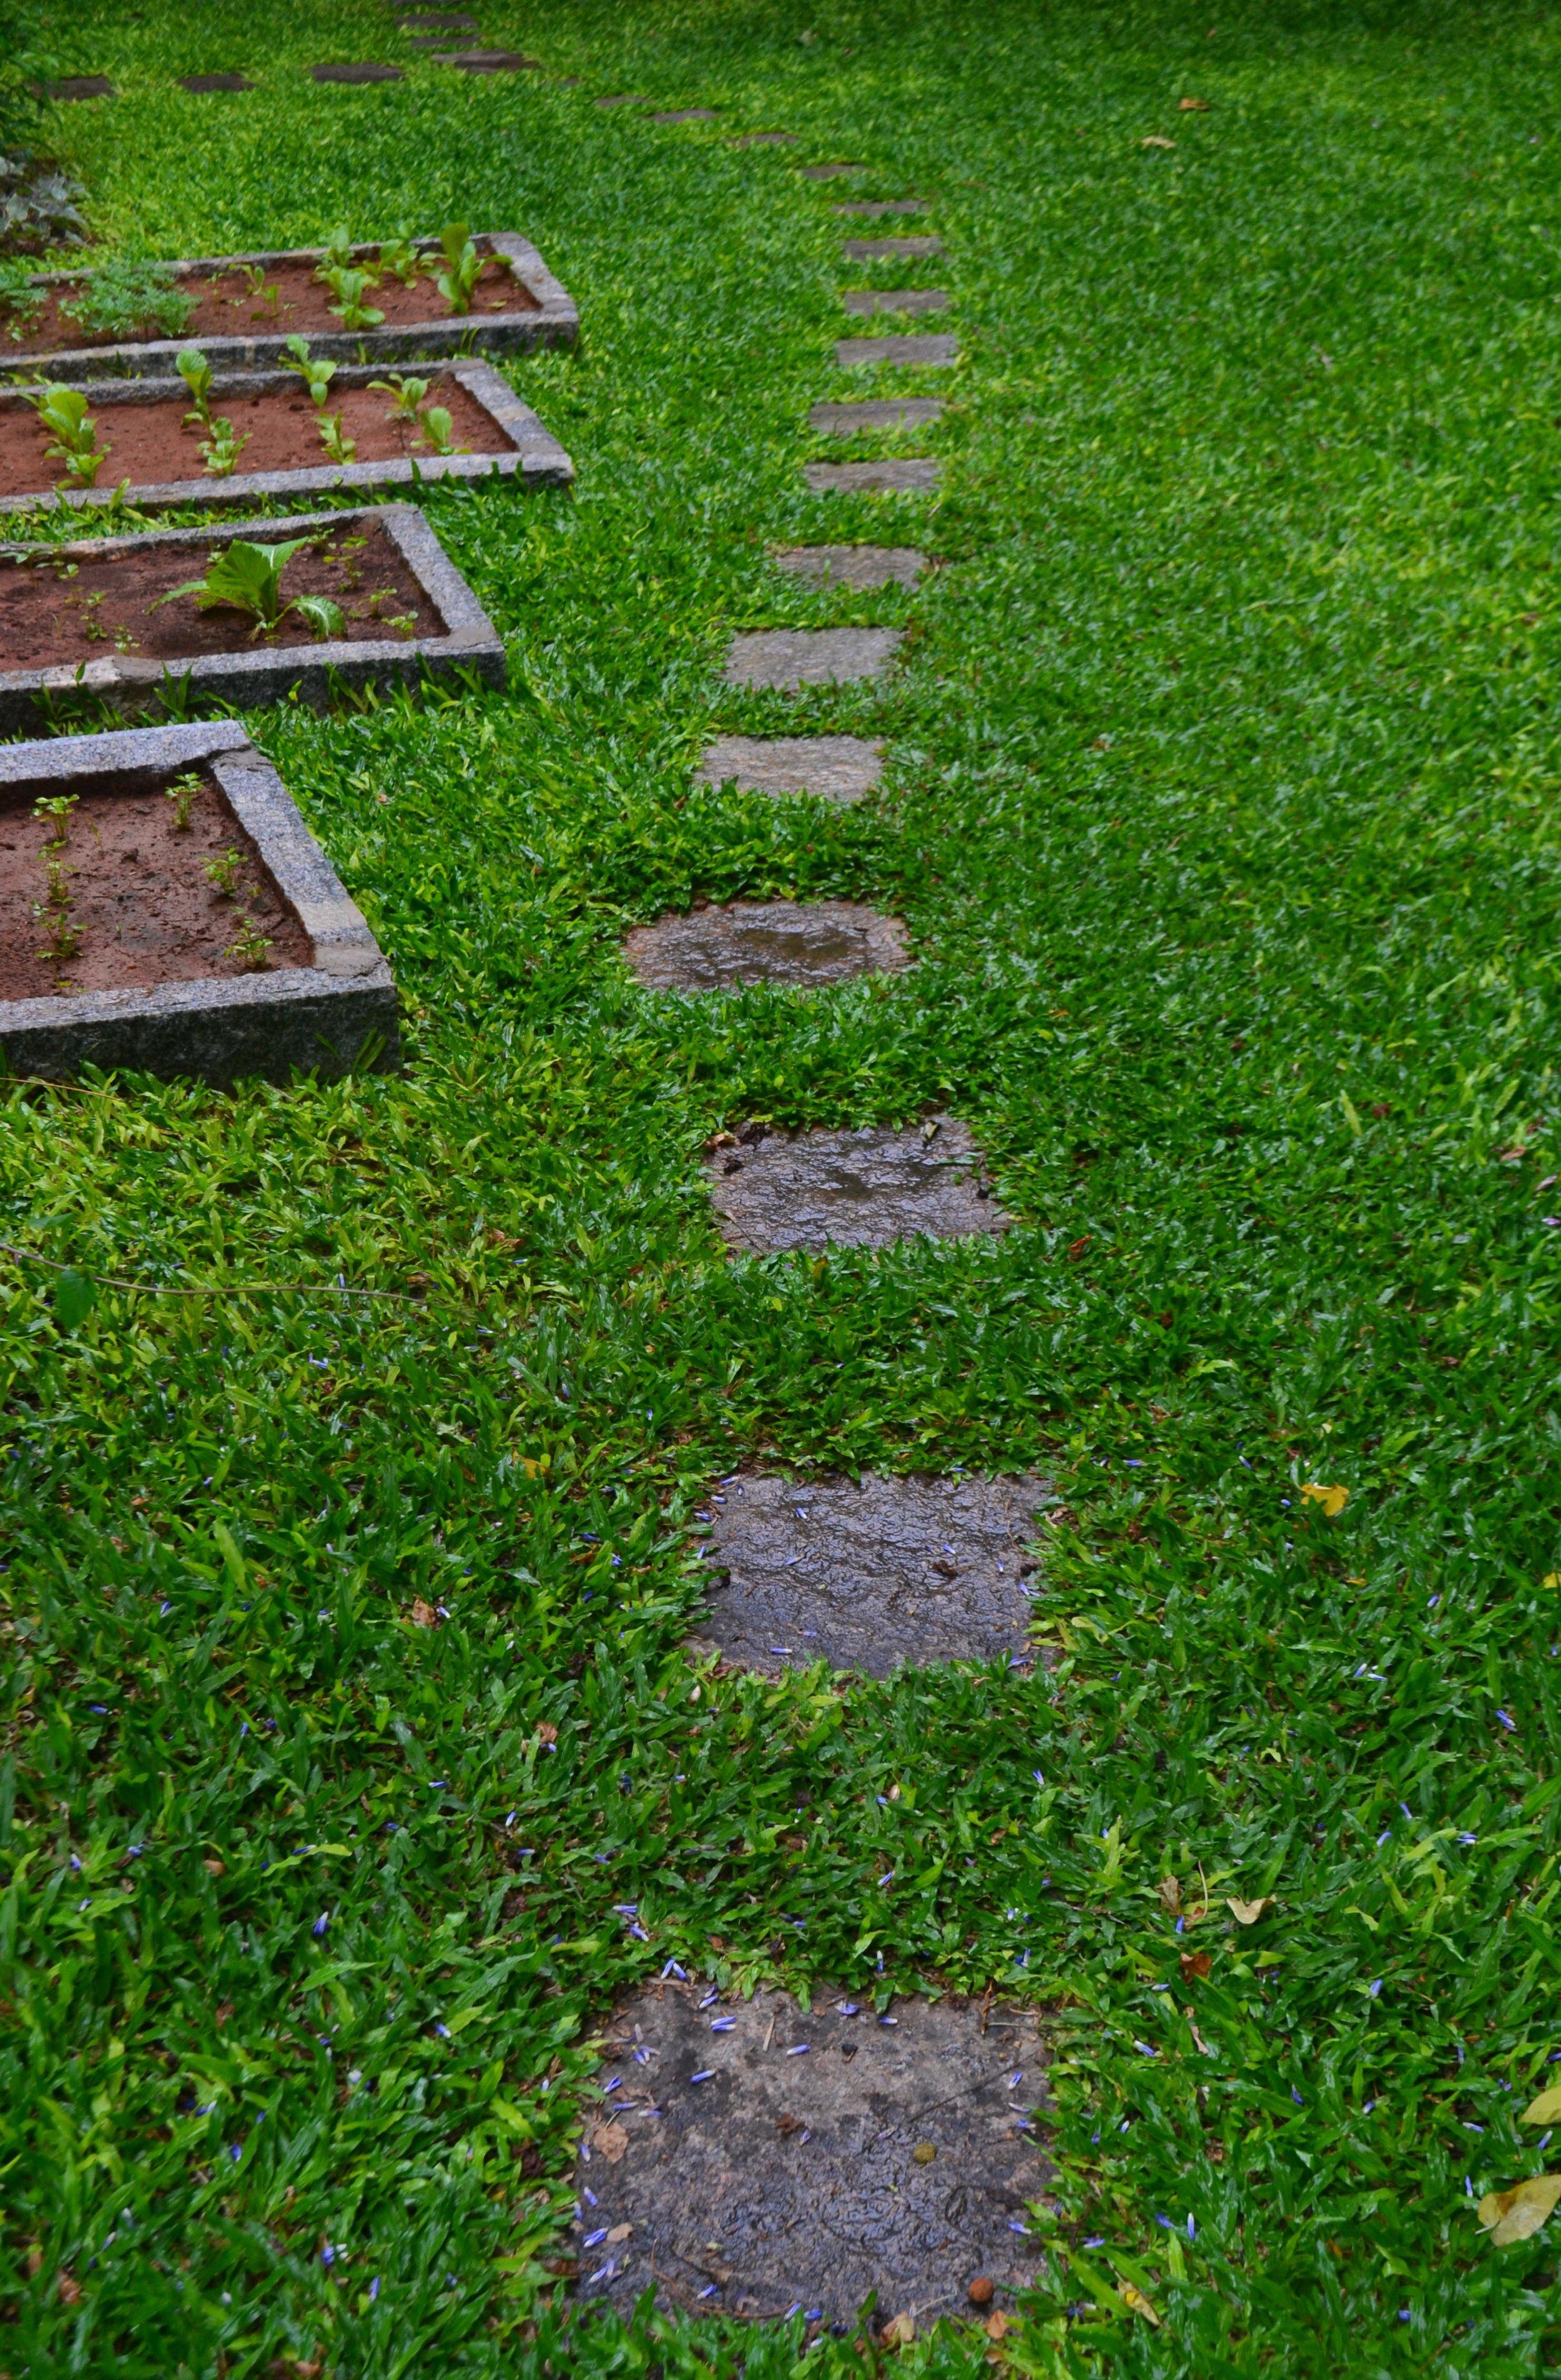 Ficus-landscape-bangalore-villa-kanak-garden-stepping stones-03